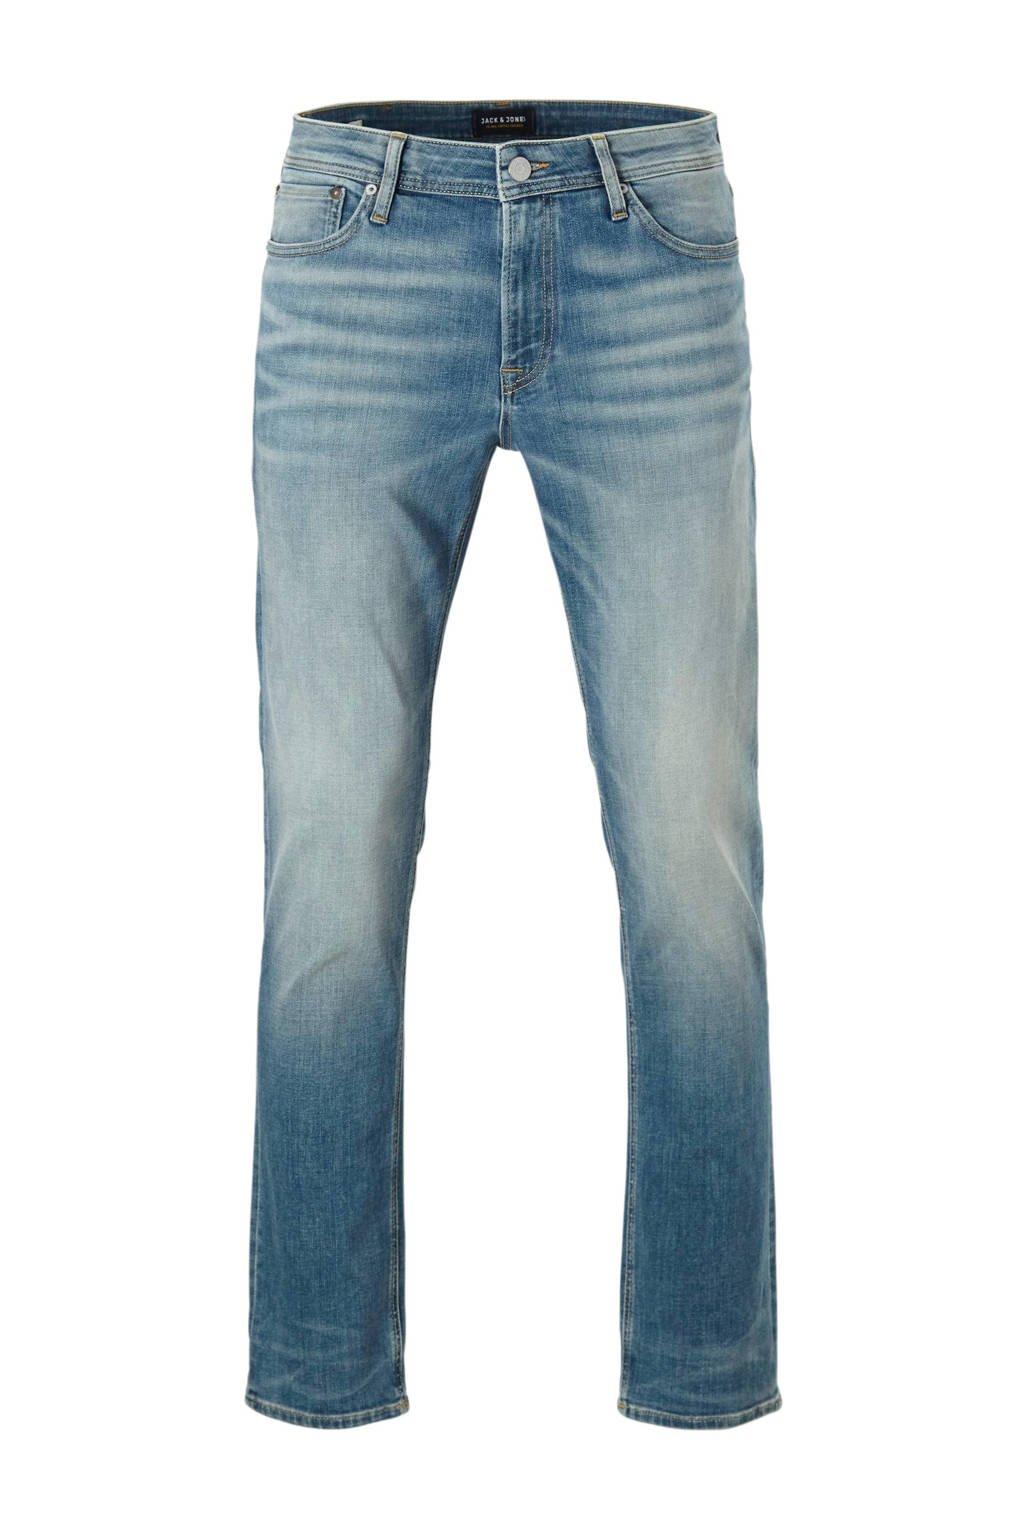 Jack & Jones Intelligence regular fit jeans Clark, Light denim